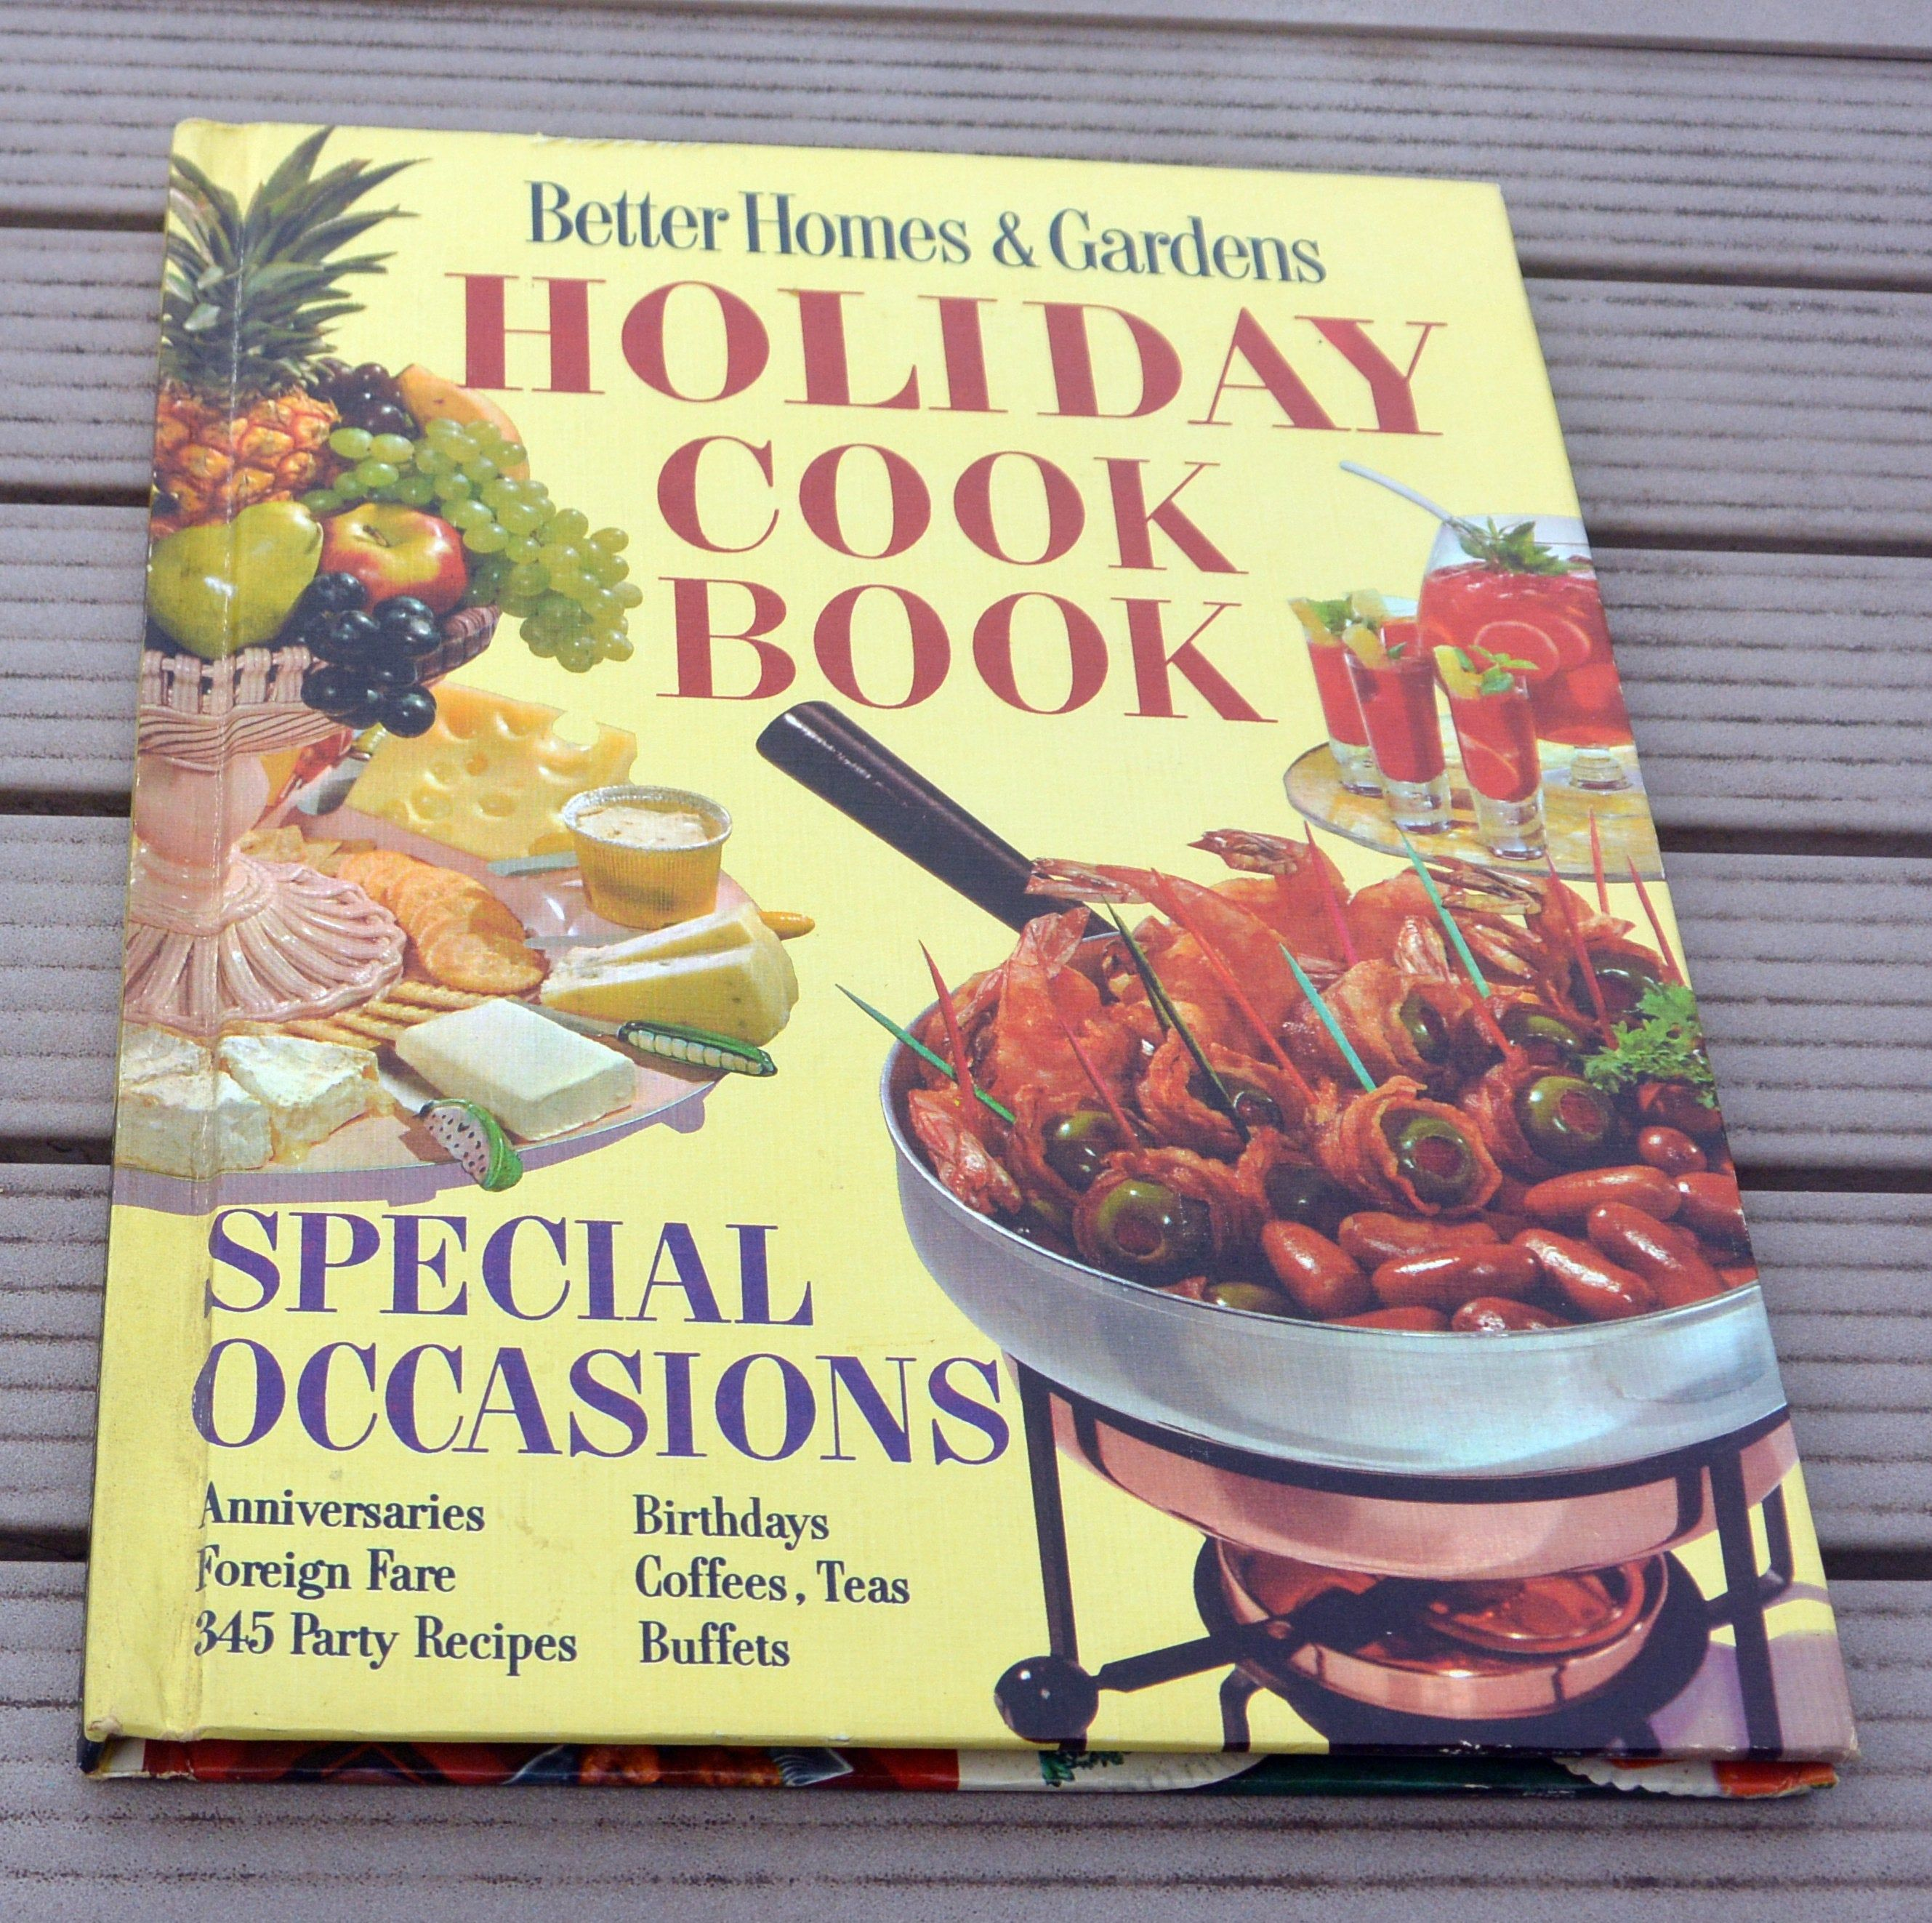 7d3e8fb0b7e2f0f71dbddf353f73f860 - Better Homes And Gardens Holiday Cookbook